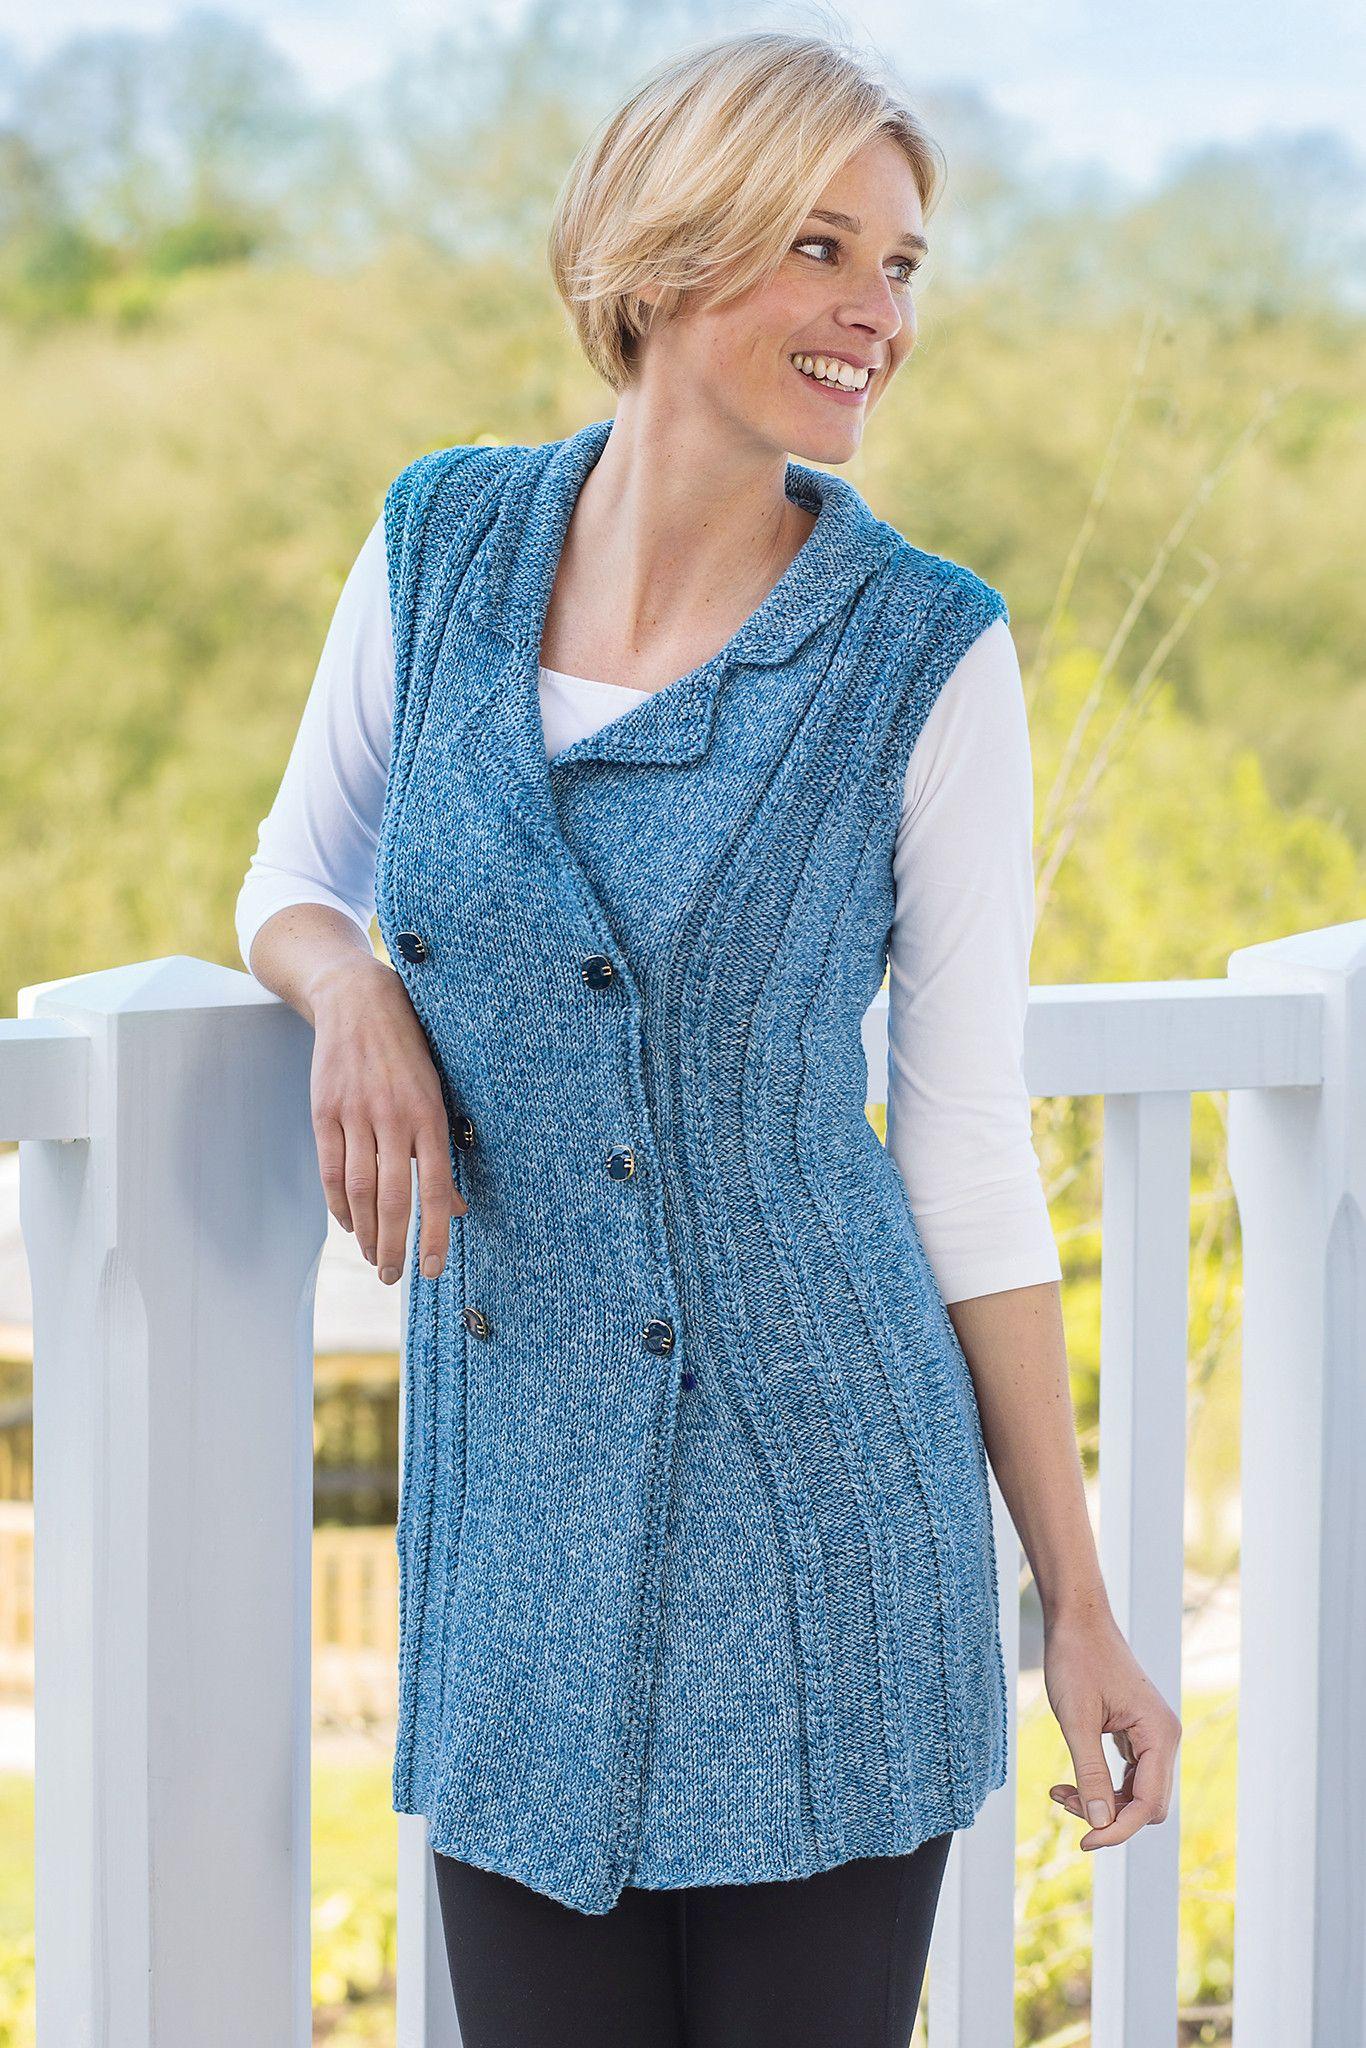 Roman Cable Ladies Waistcoat Knitting Pattern | Waistcoat ...